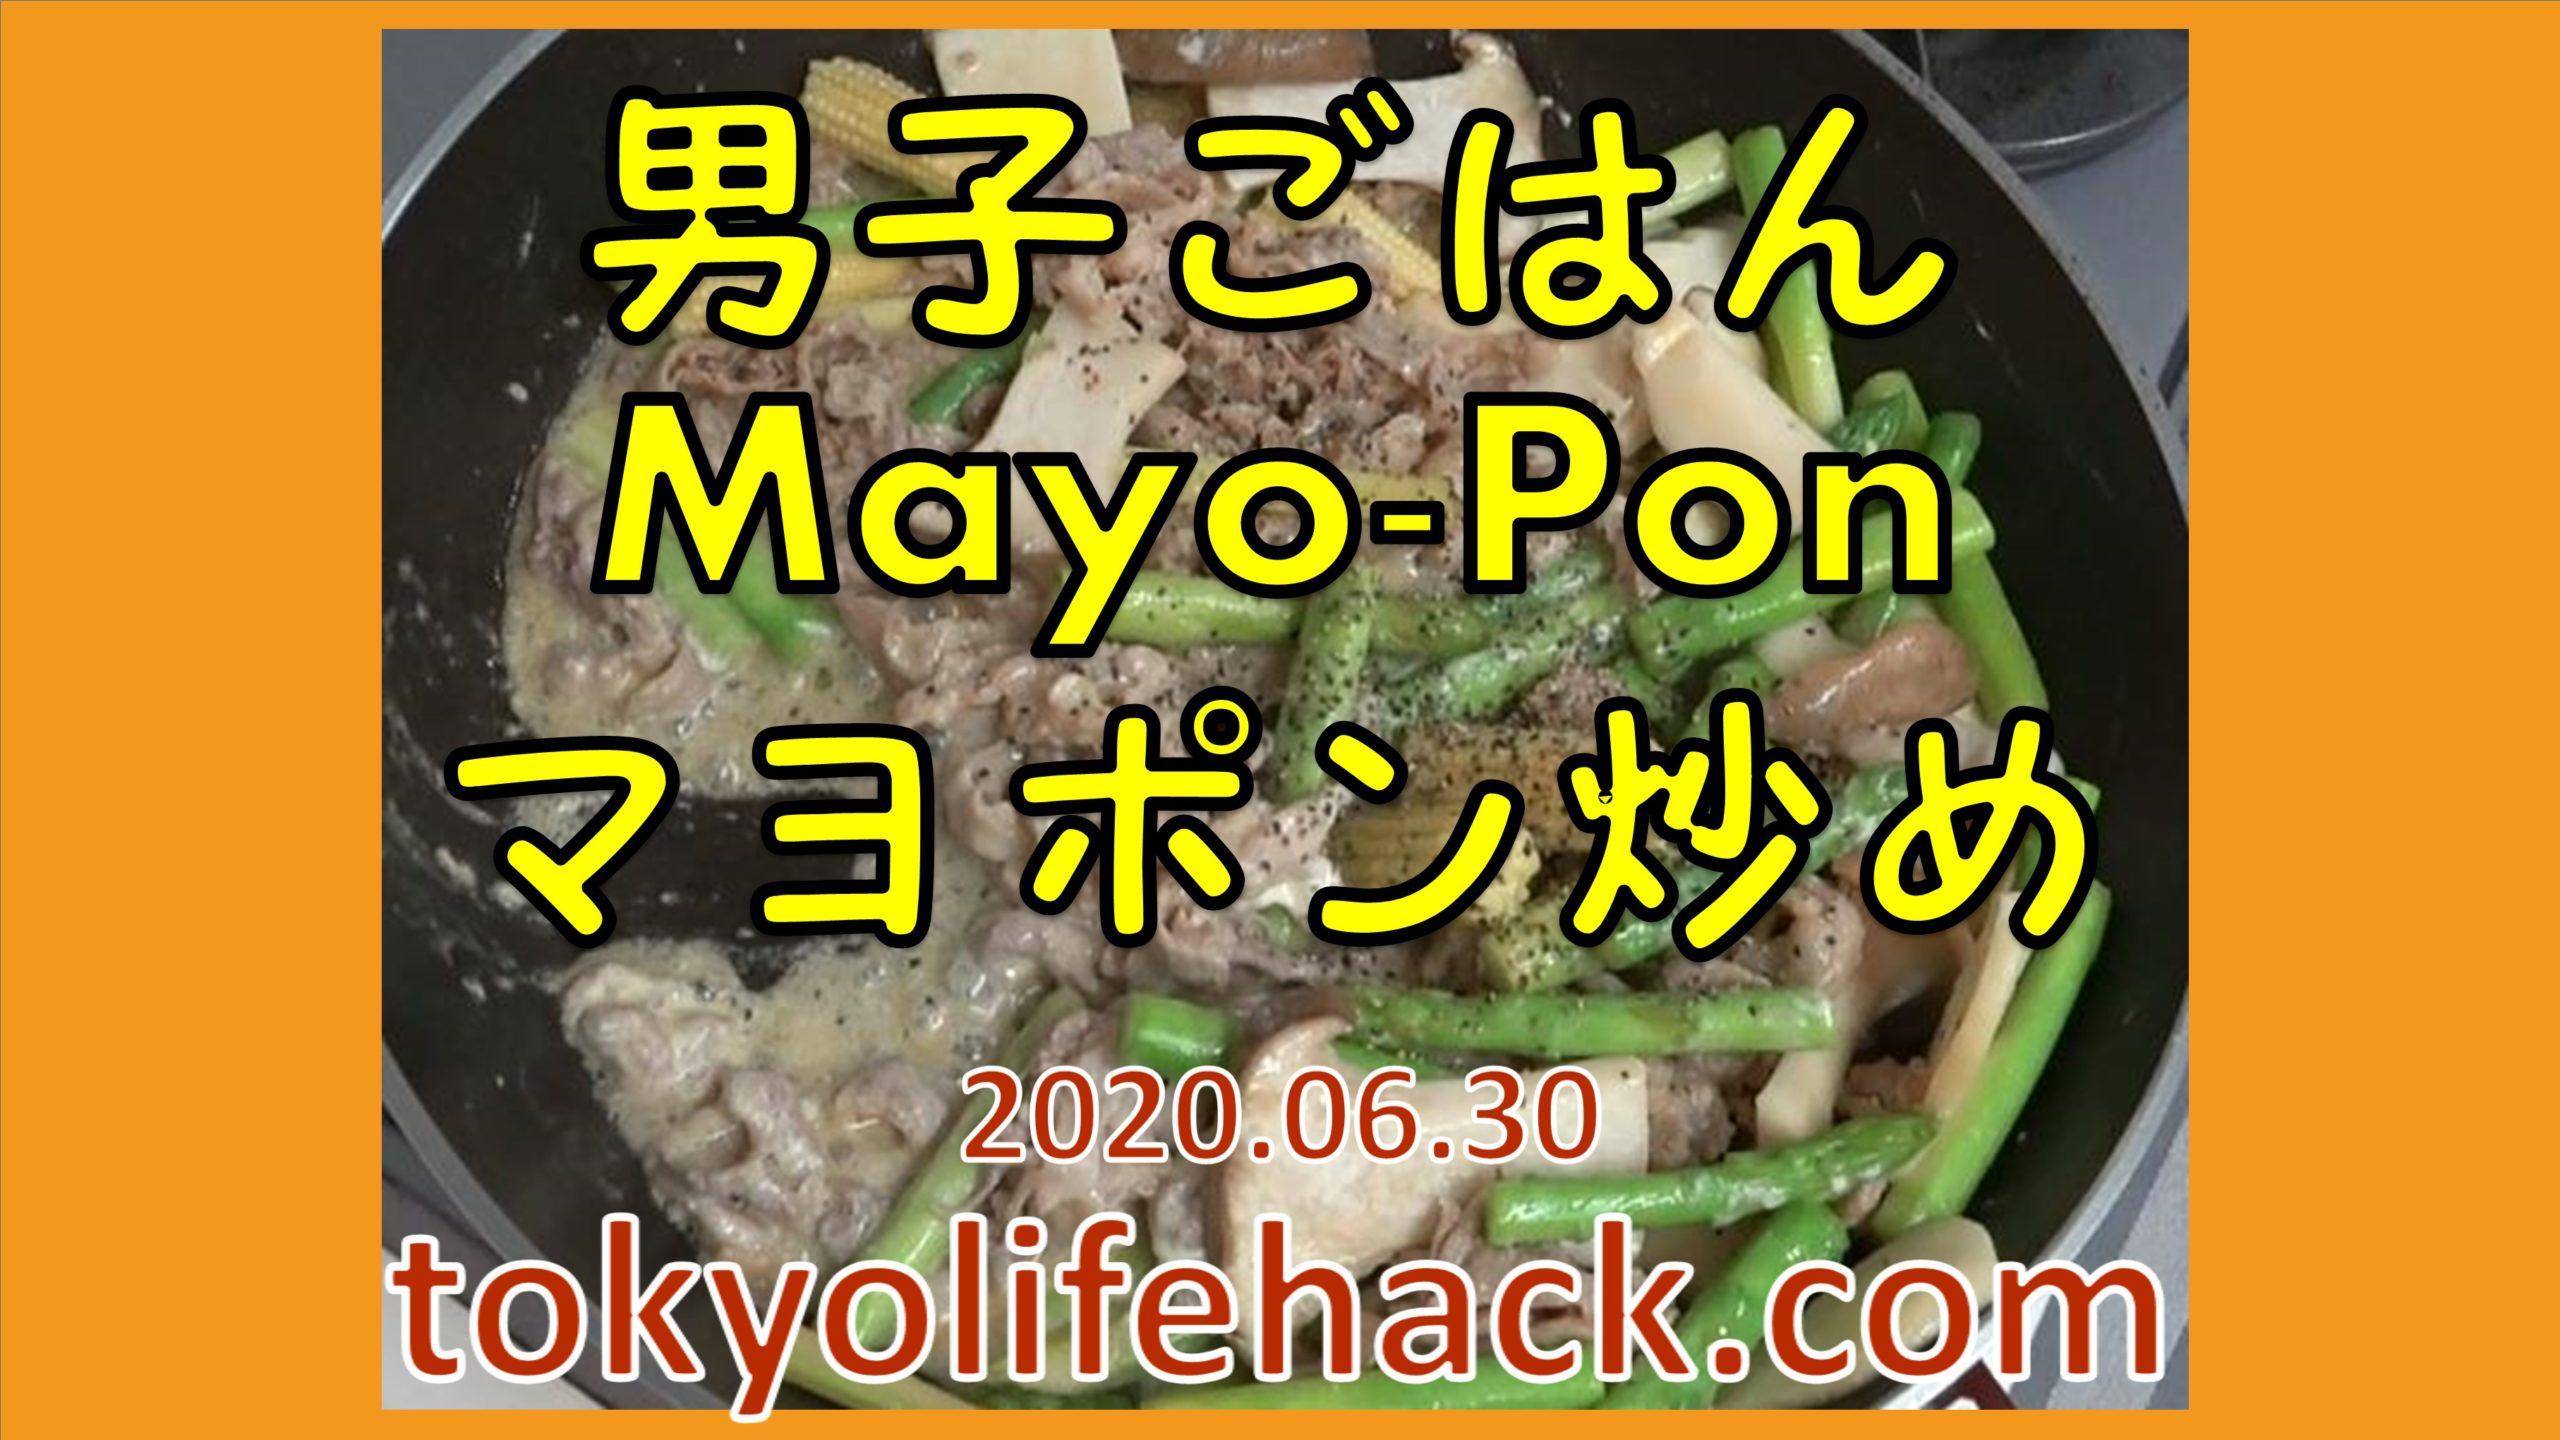 Mayopon